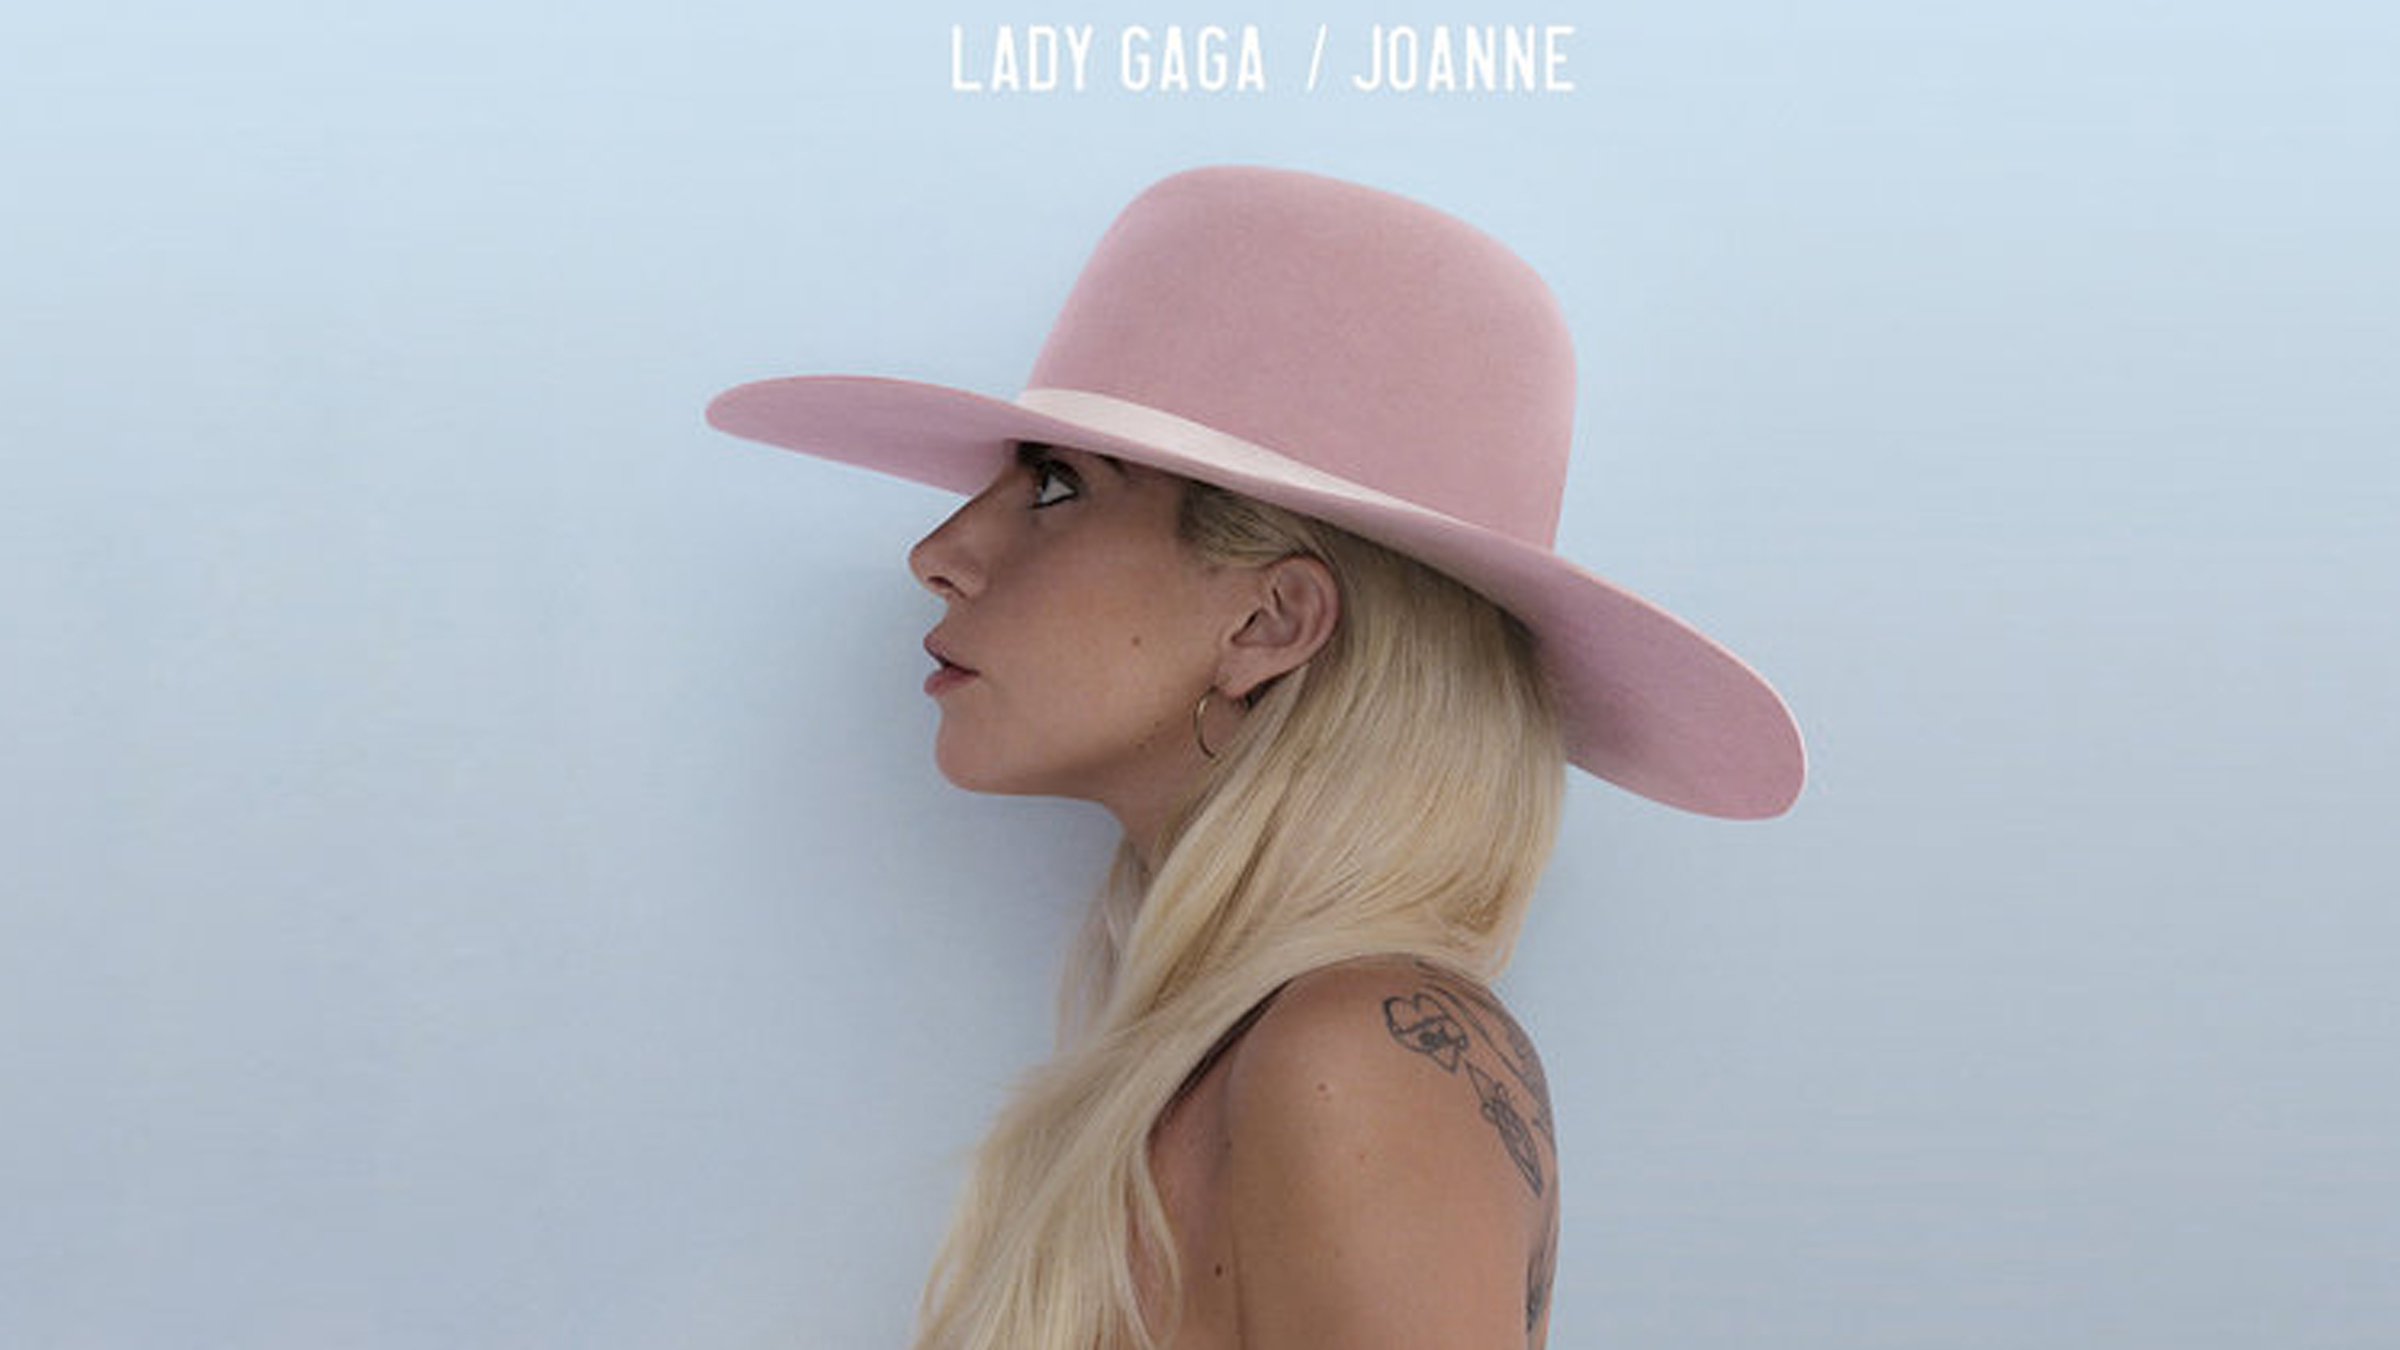 Gaga joanne teaser